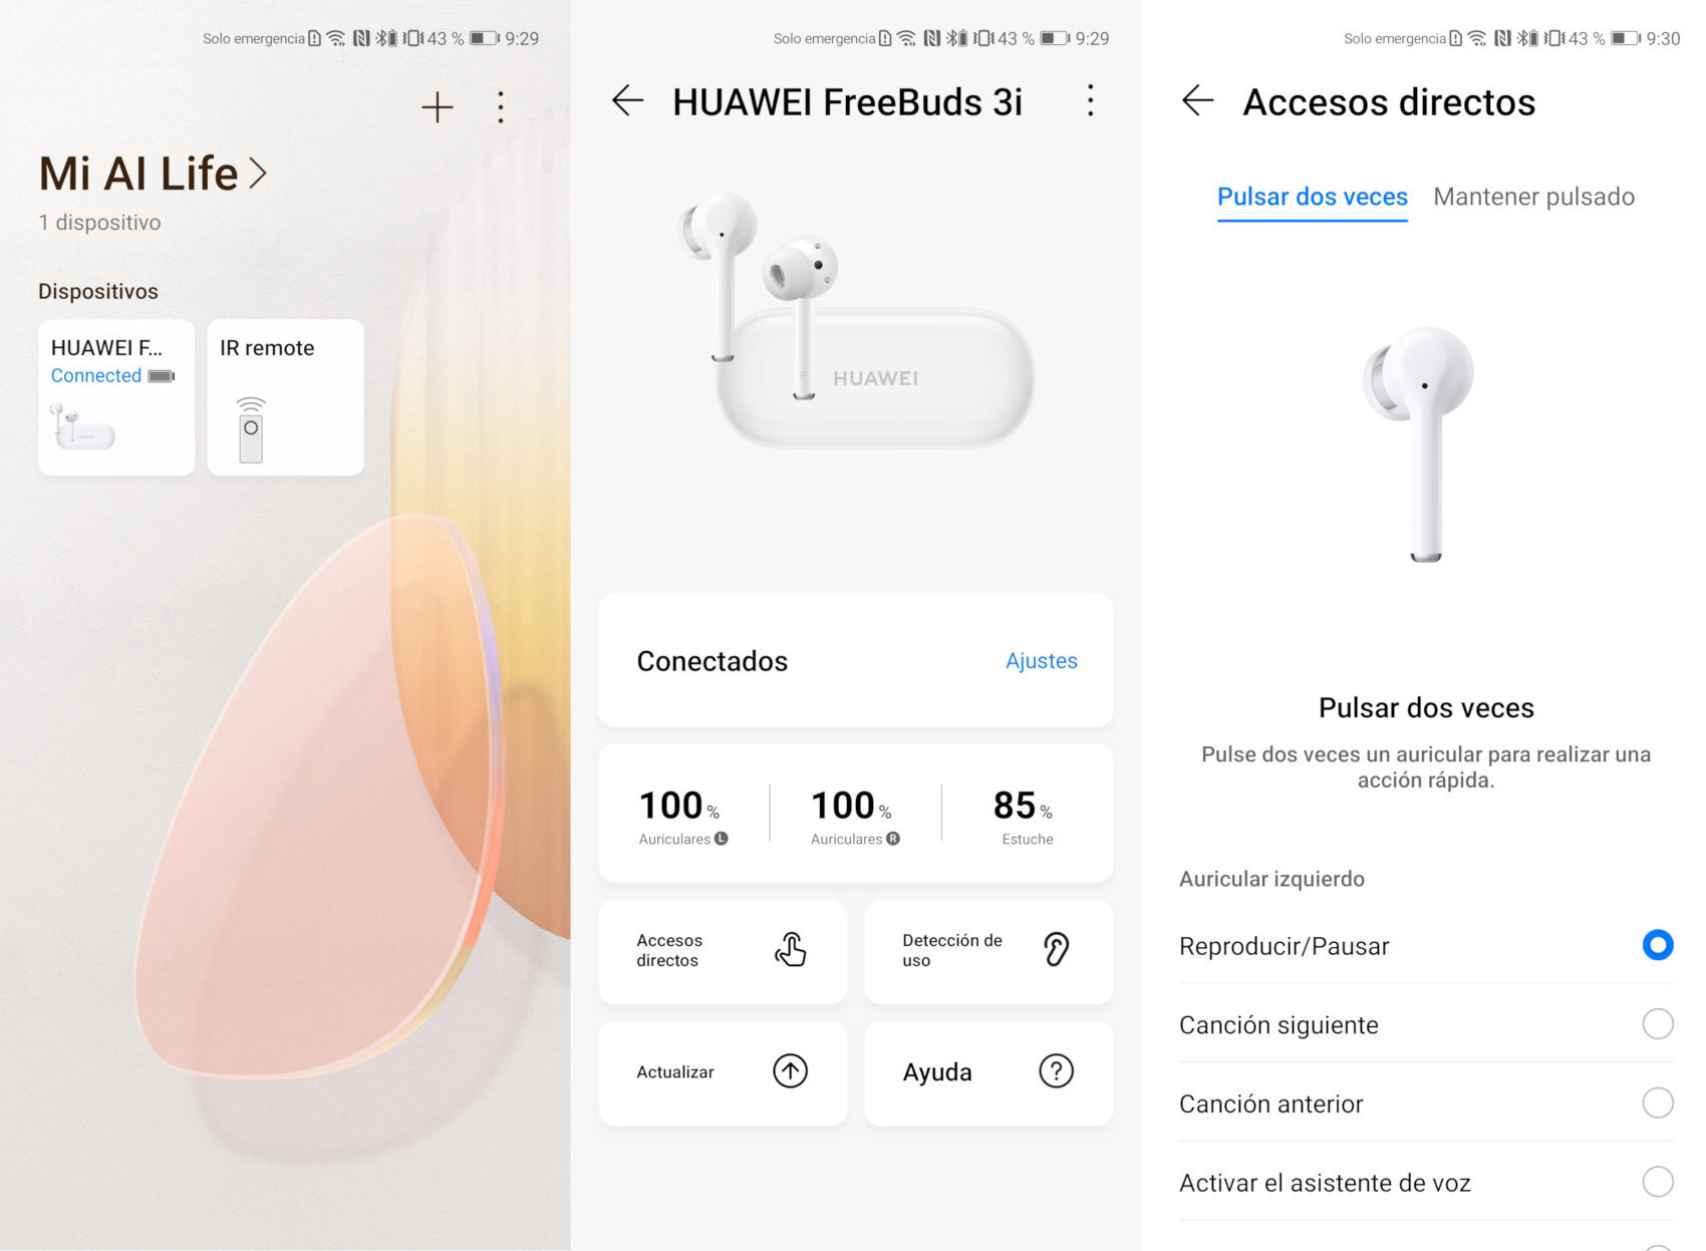 La app AI Life nos permite configurar los Huawei FreeBuds 3i